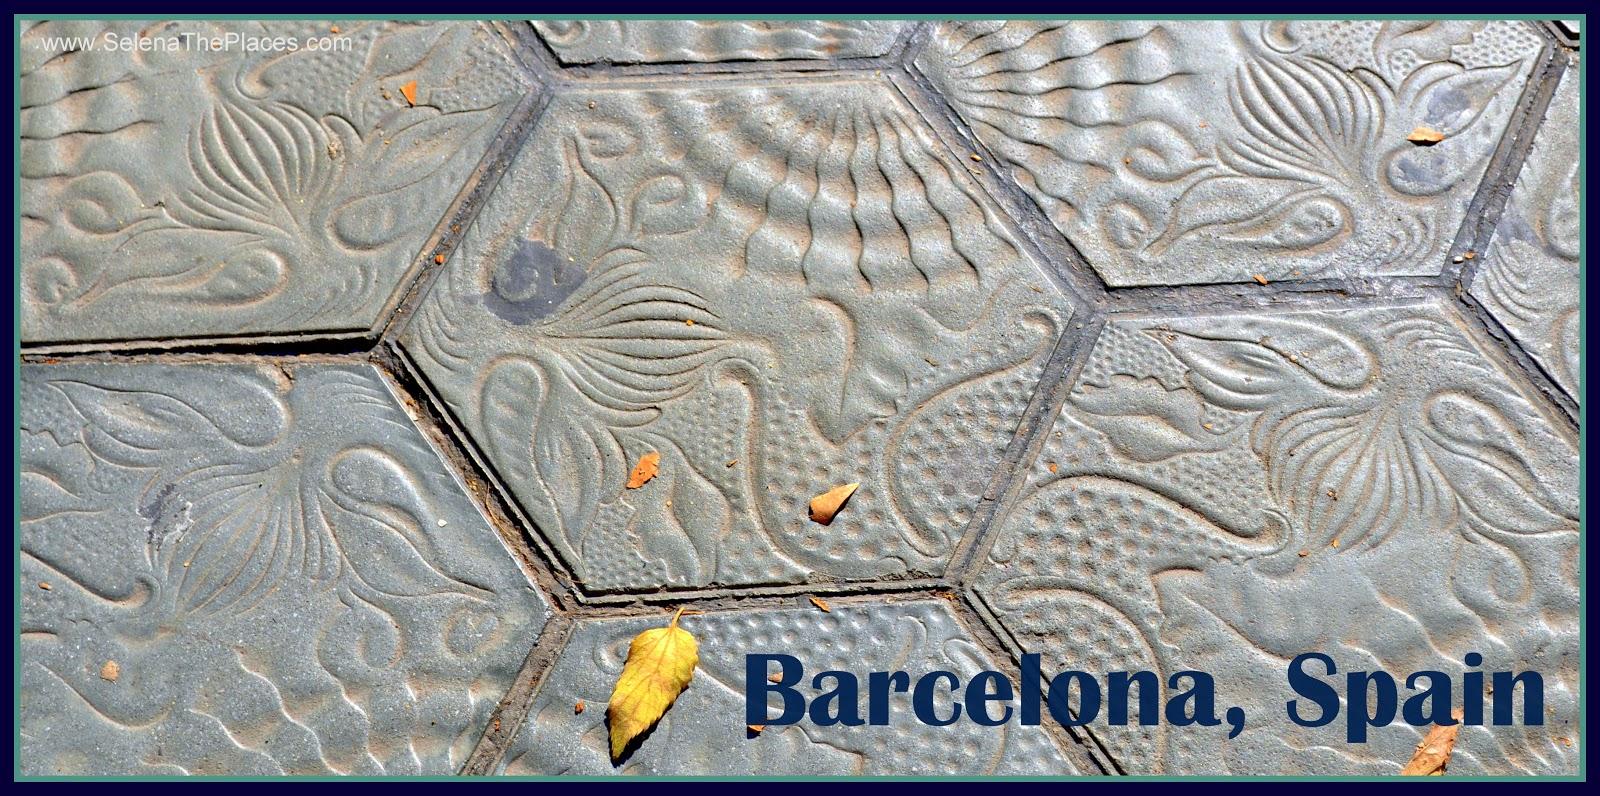 Barclona, Spain